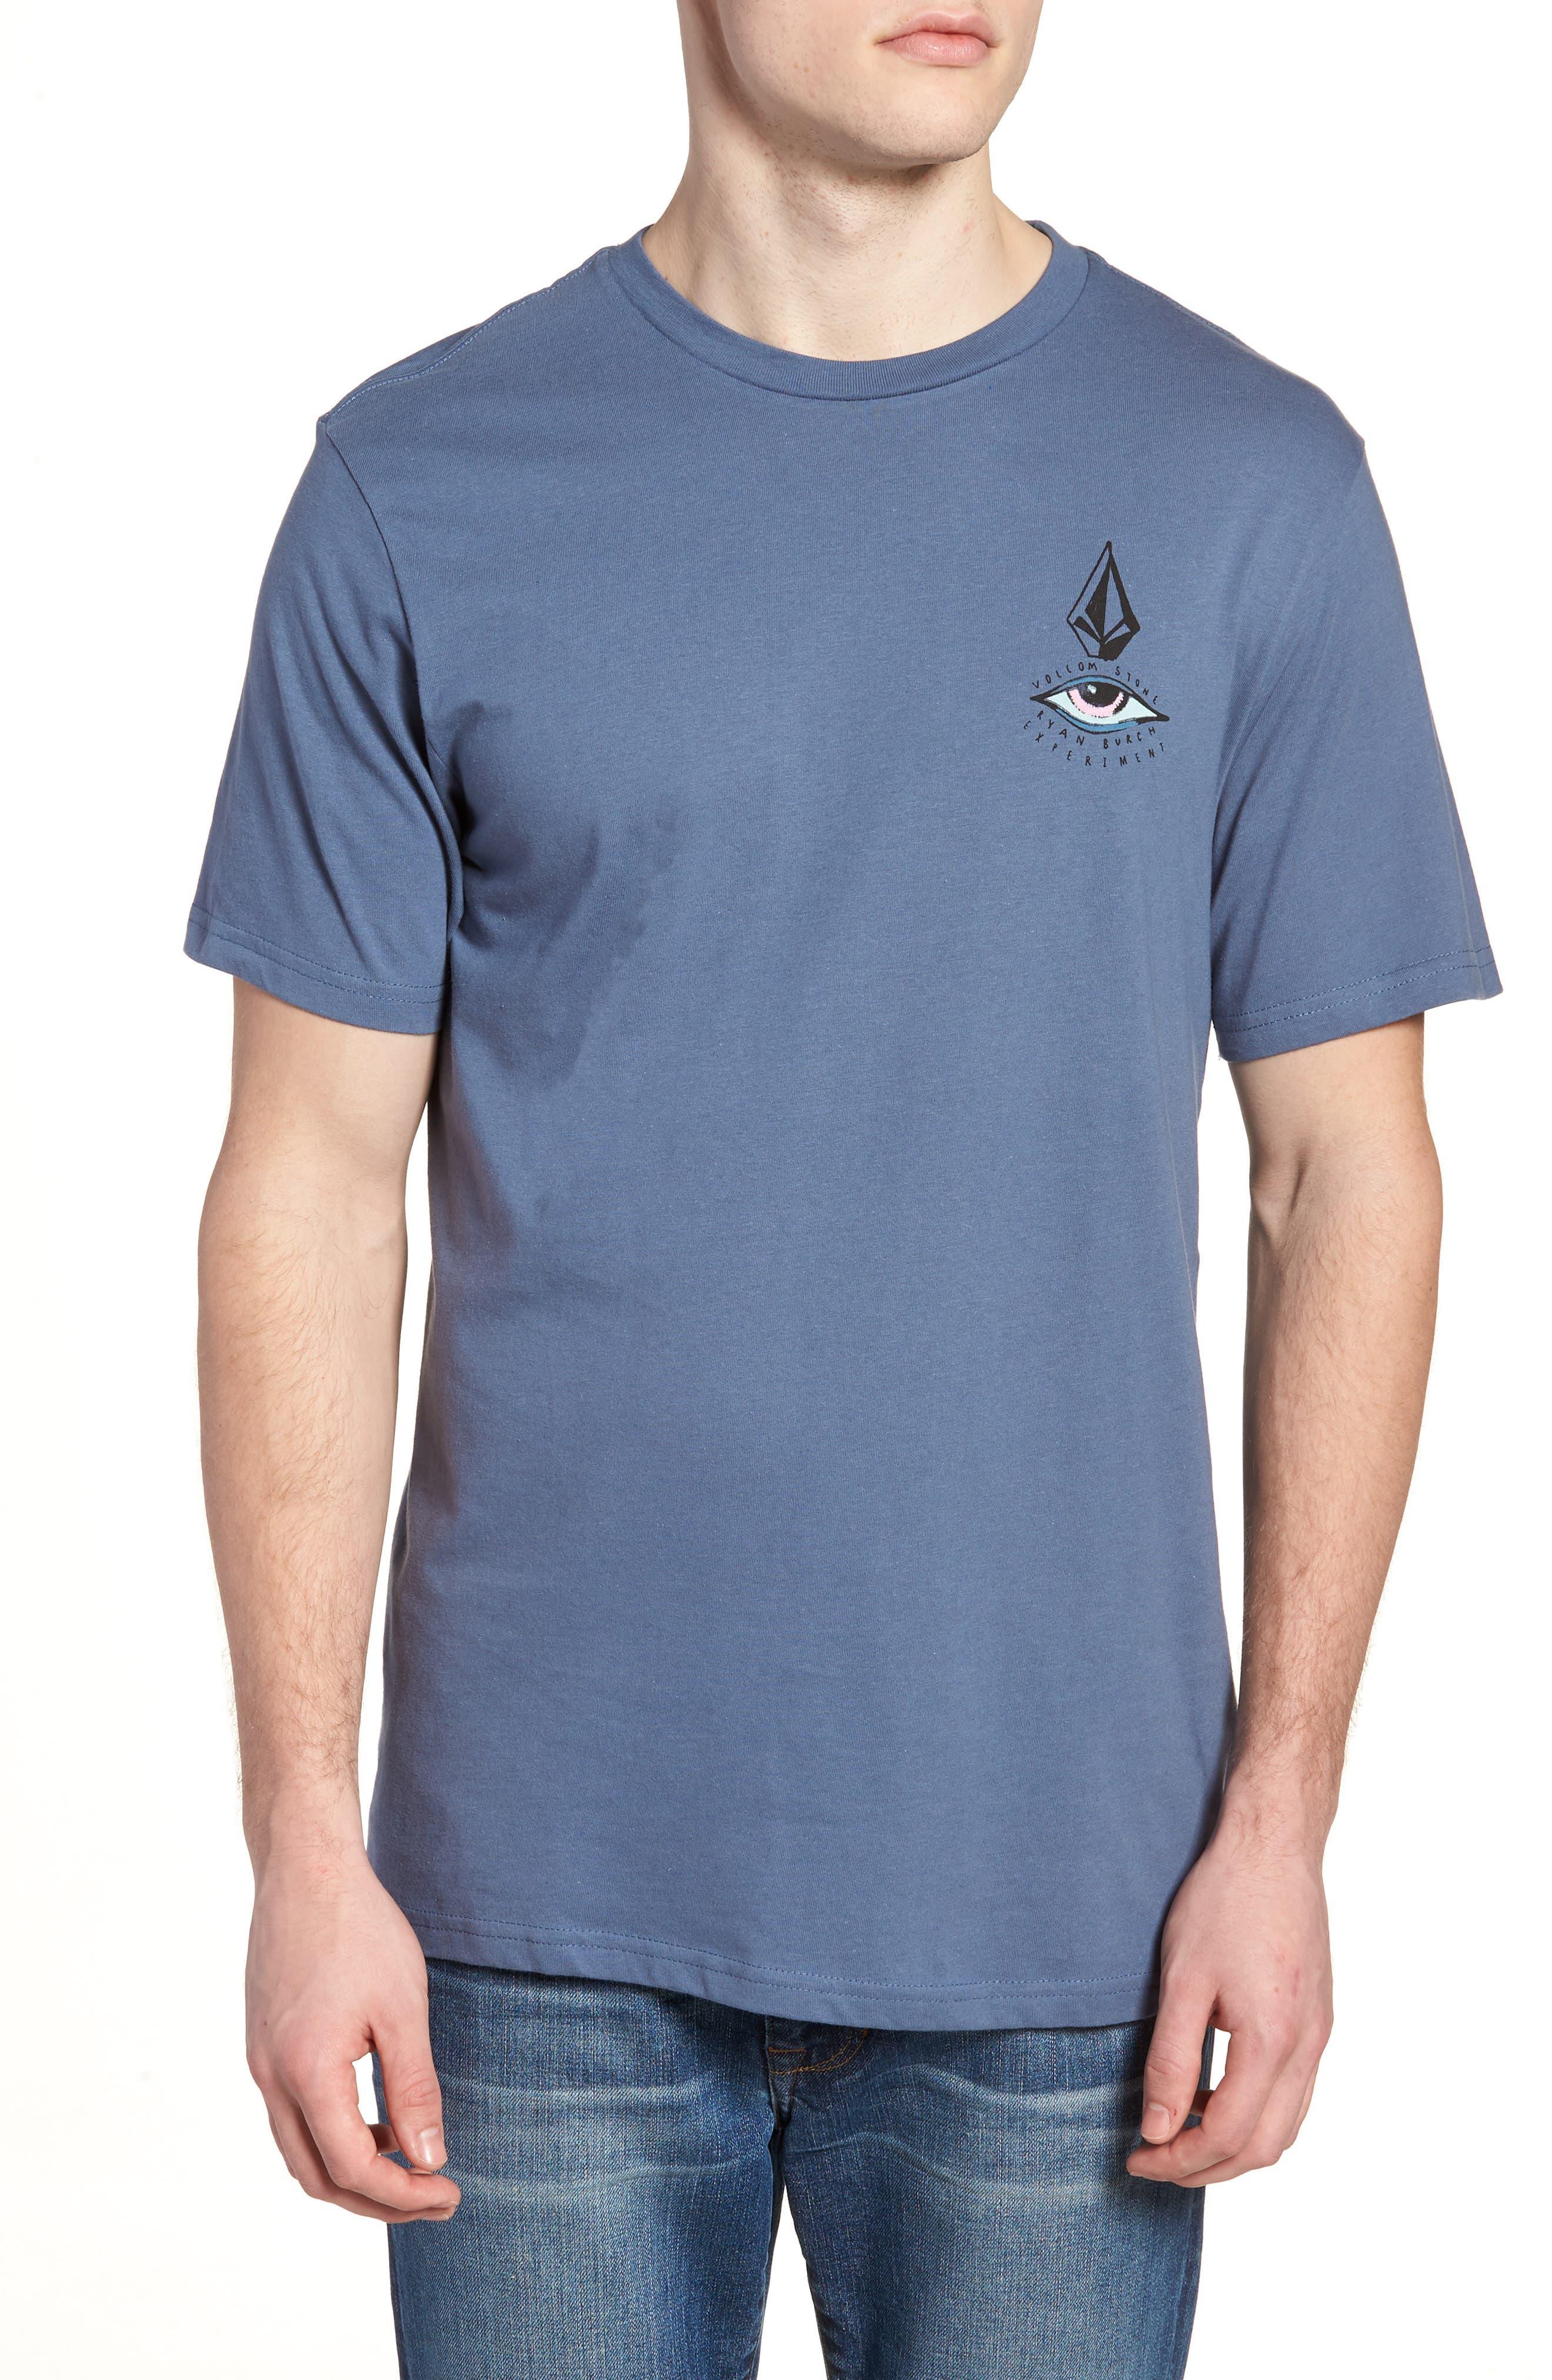 Burch Eye Graphic T-Shirt,                             Main thumbnail 1, color,                             Deep Blue